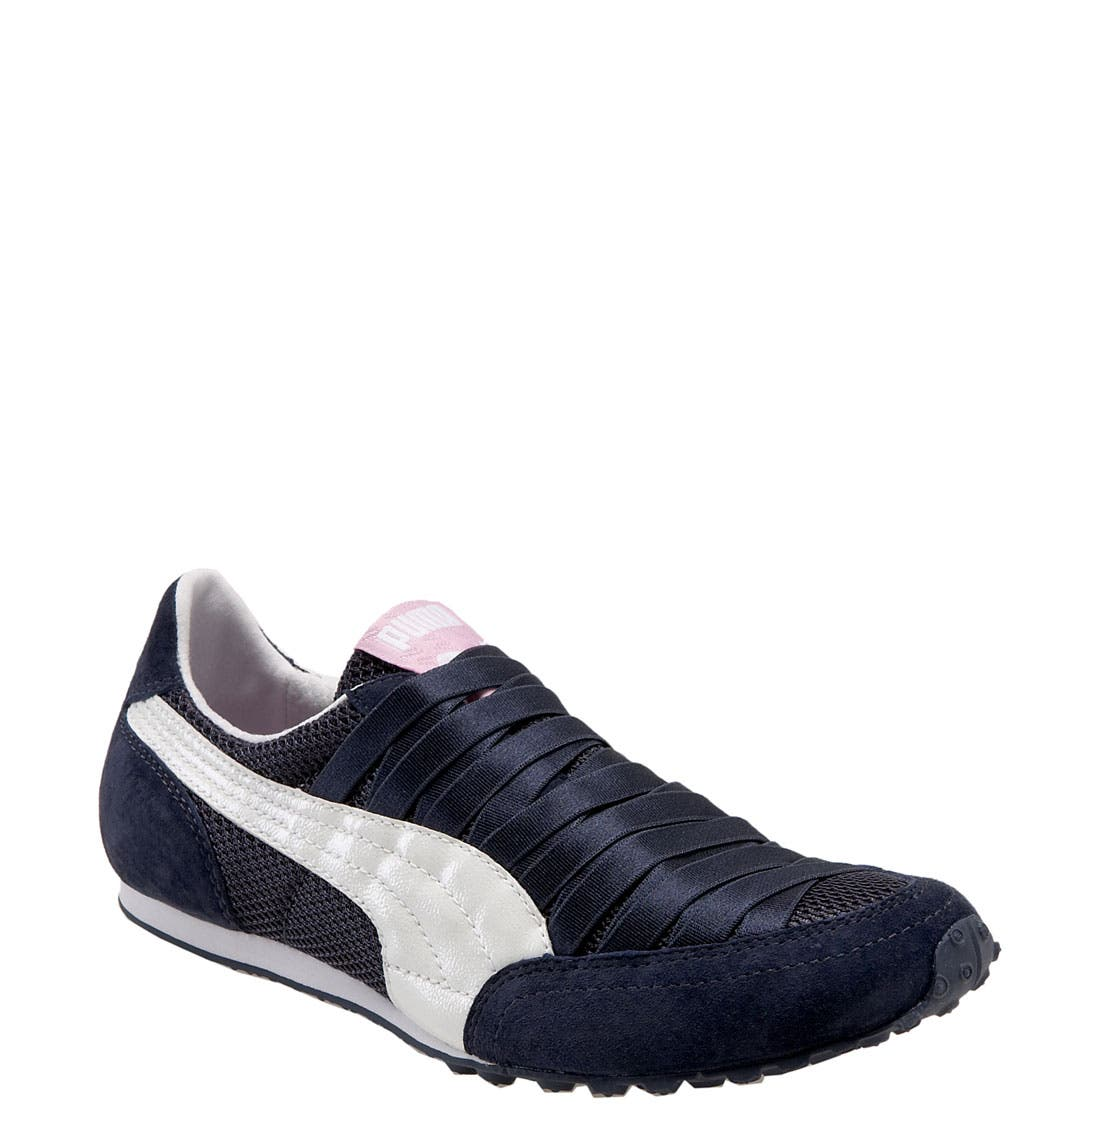 Alternate Image 1 Selected - Puma 'Imani' Slip-On Sneaker